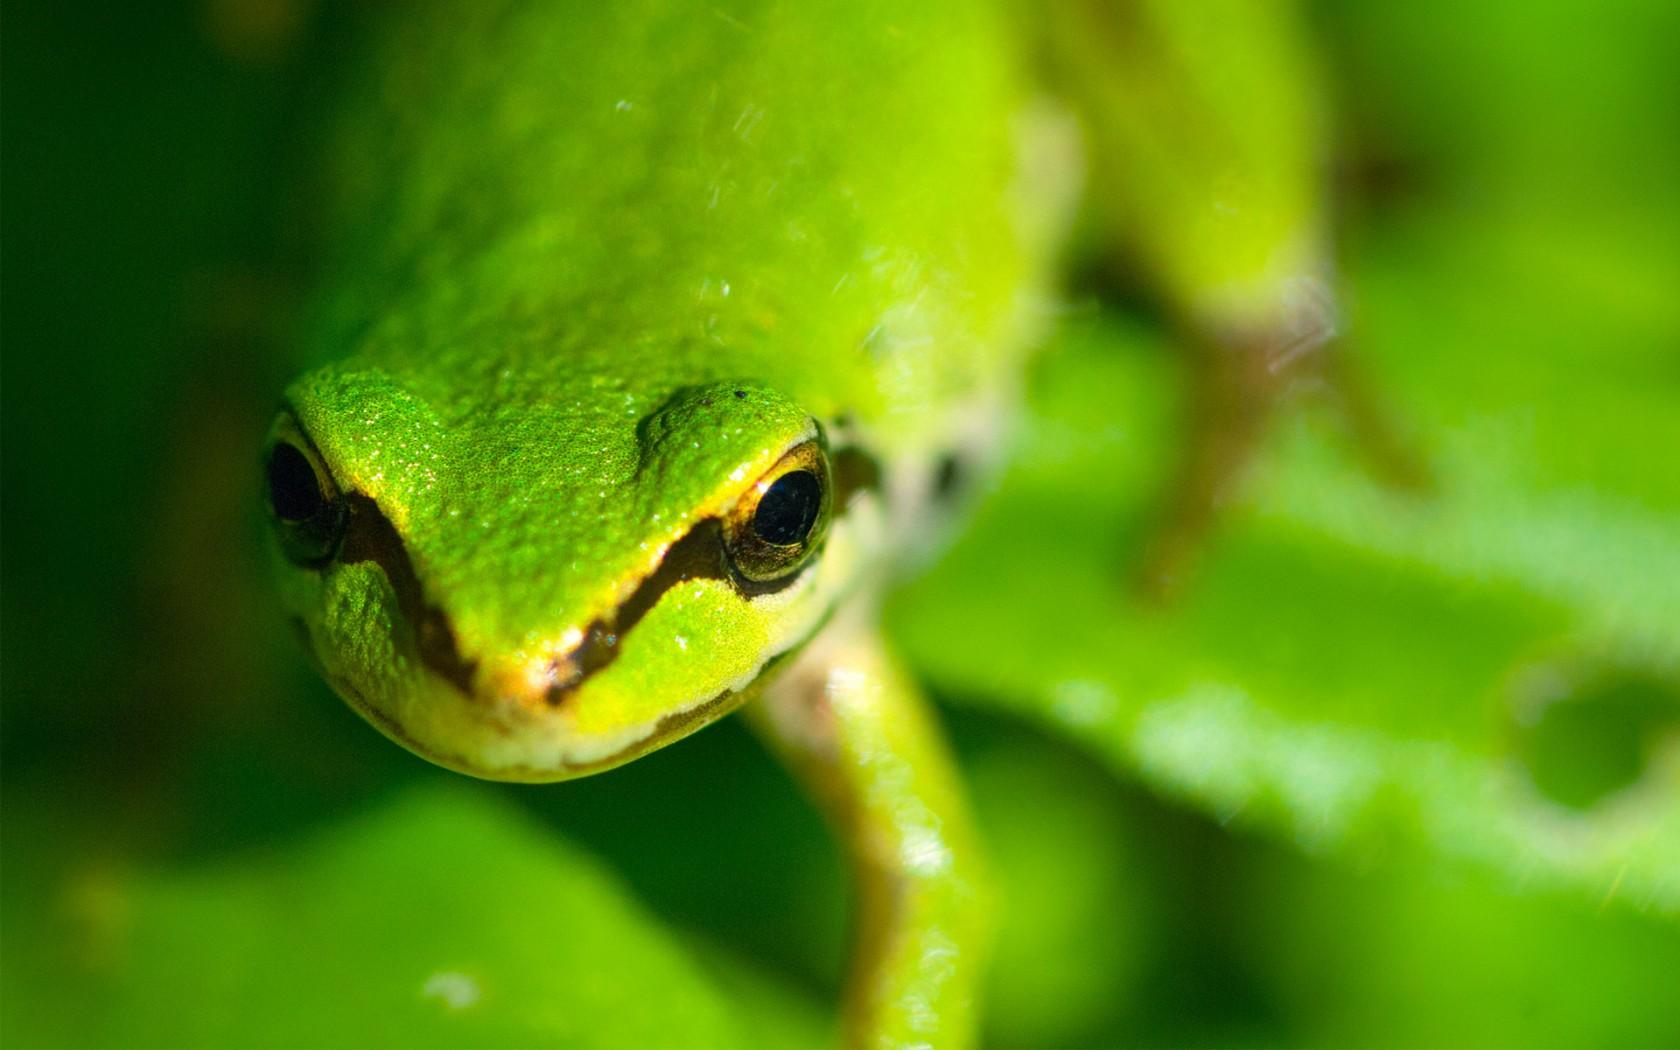 Frog Green Wallpaper Hd Desktop Wallpapers 4k Hd